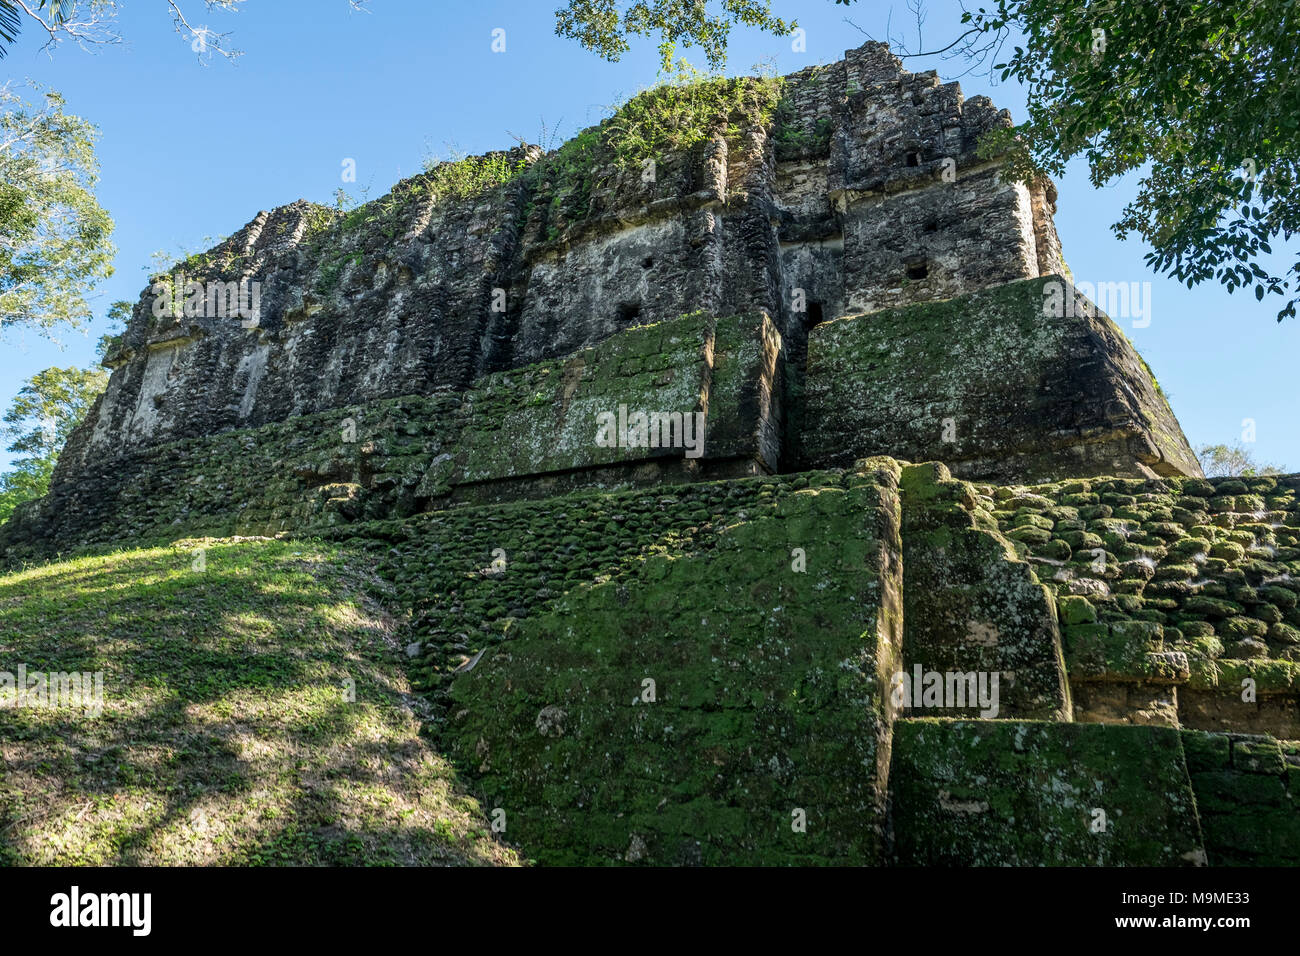 Ancient Mayan temple remains of Uaxactun, Guatemala - Stock Image